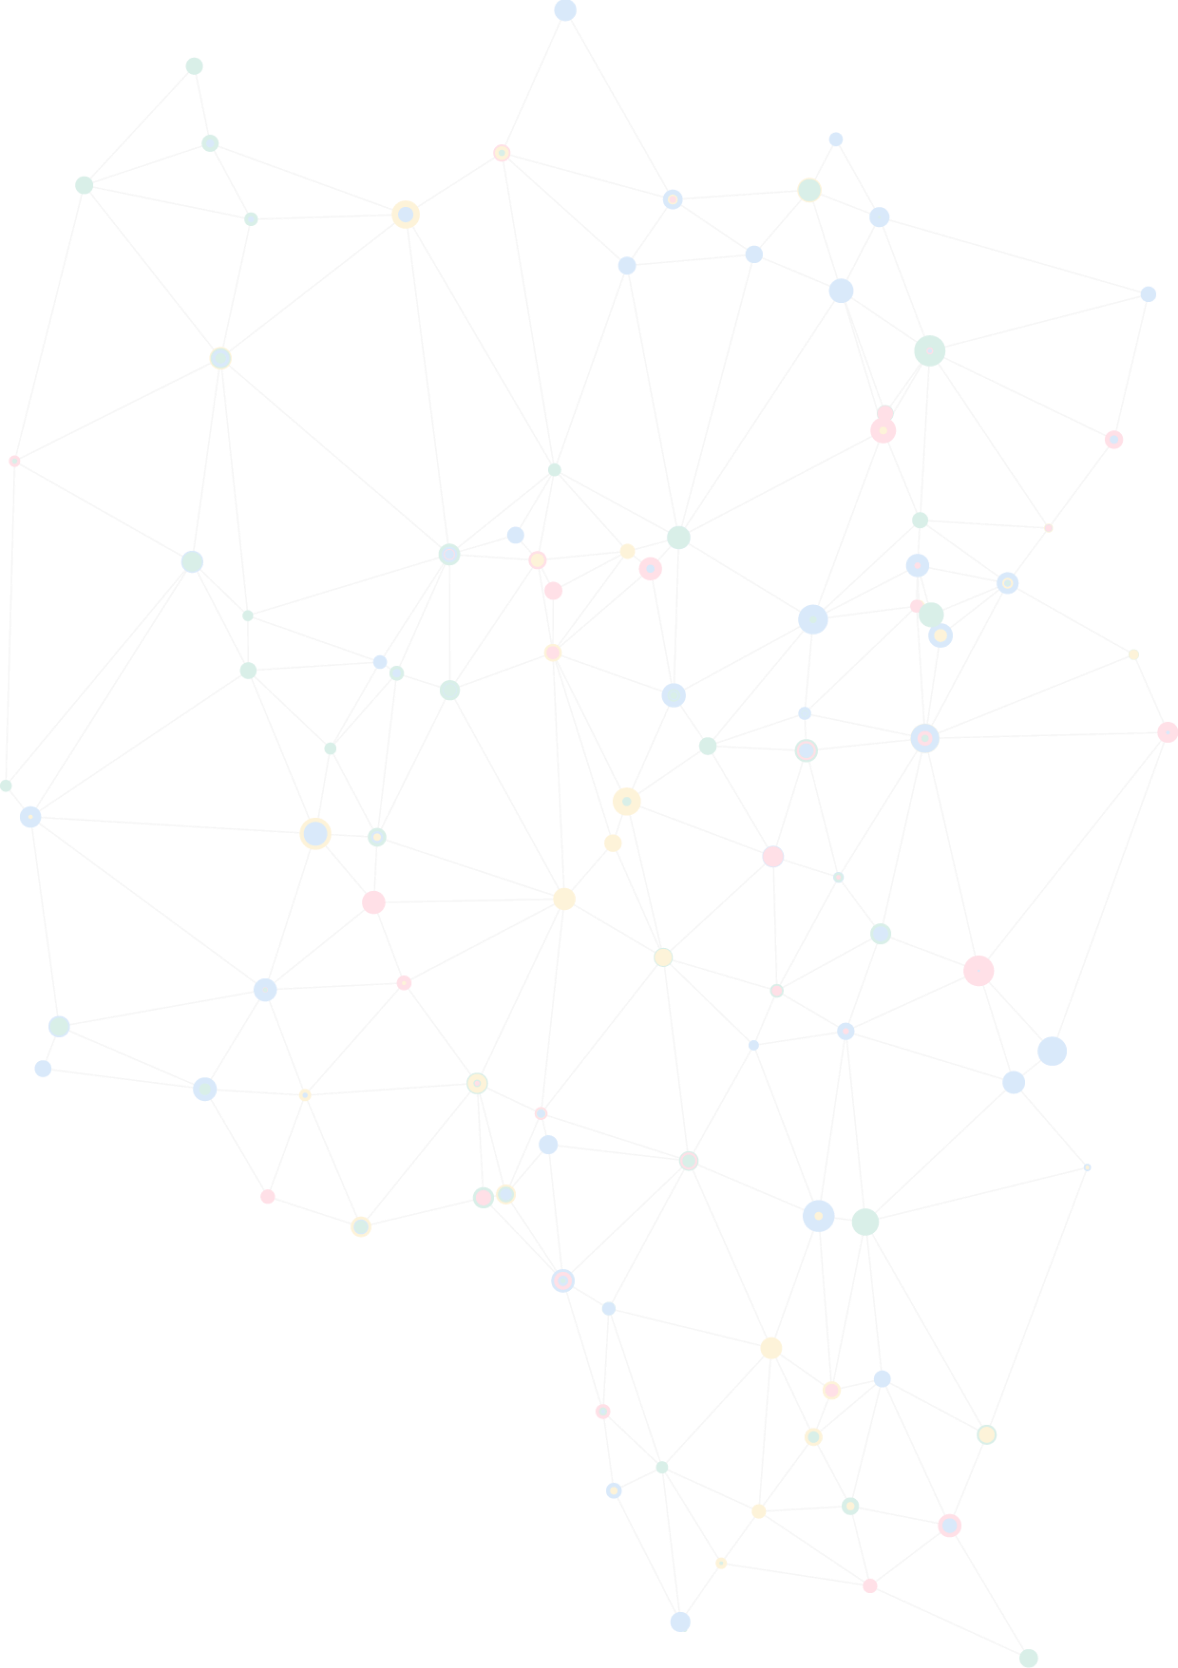 bg-network